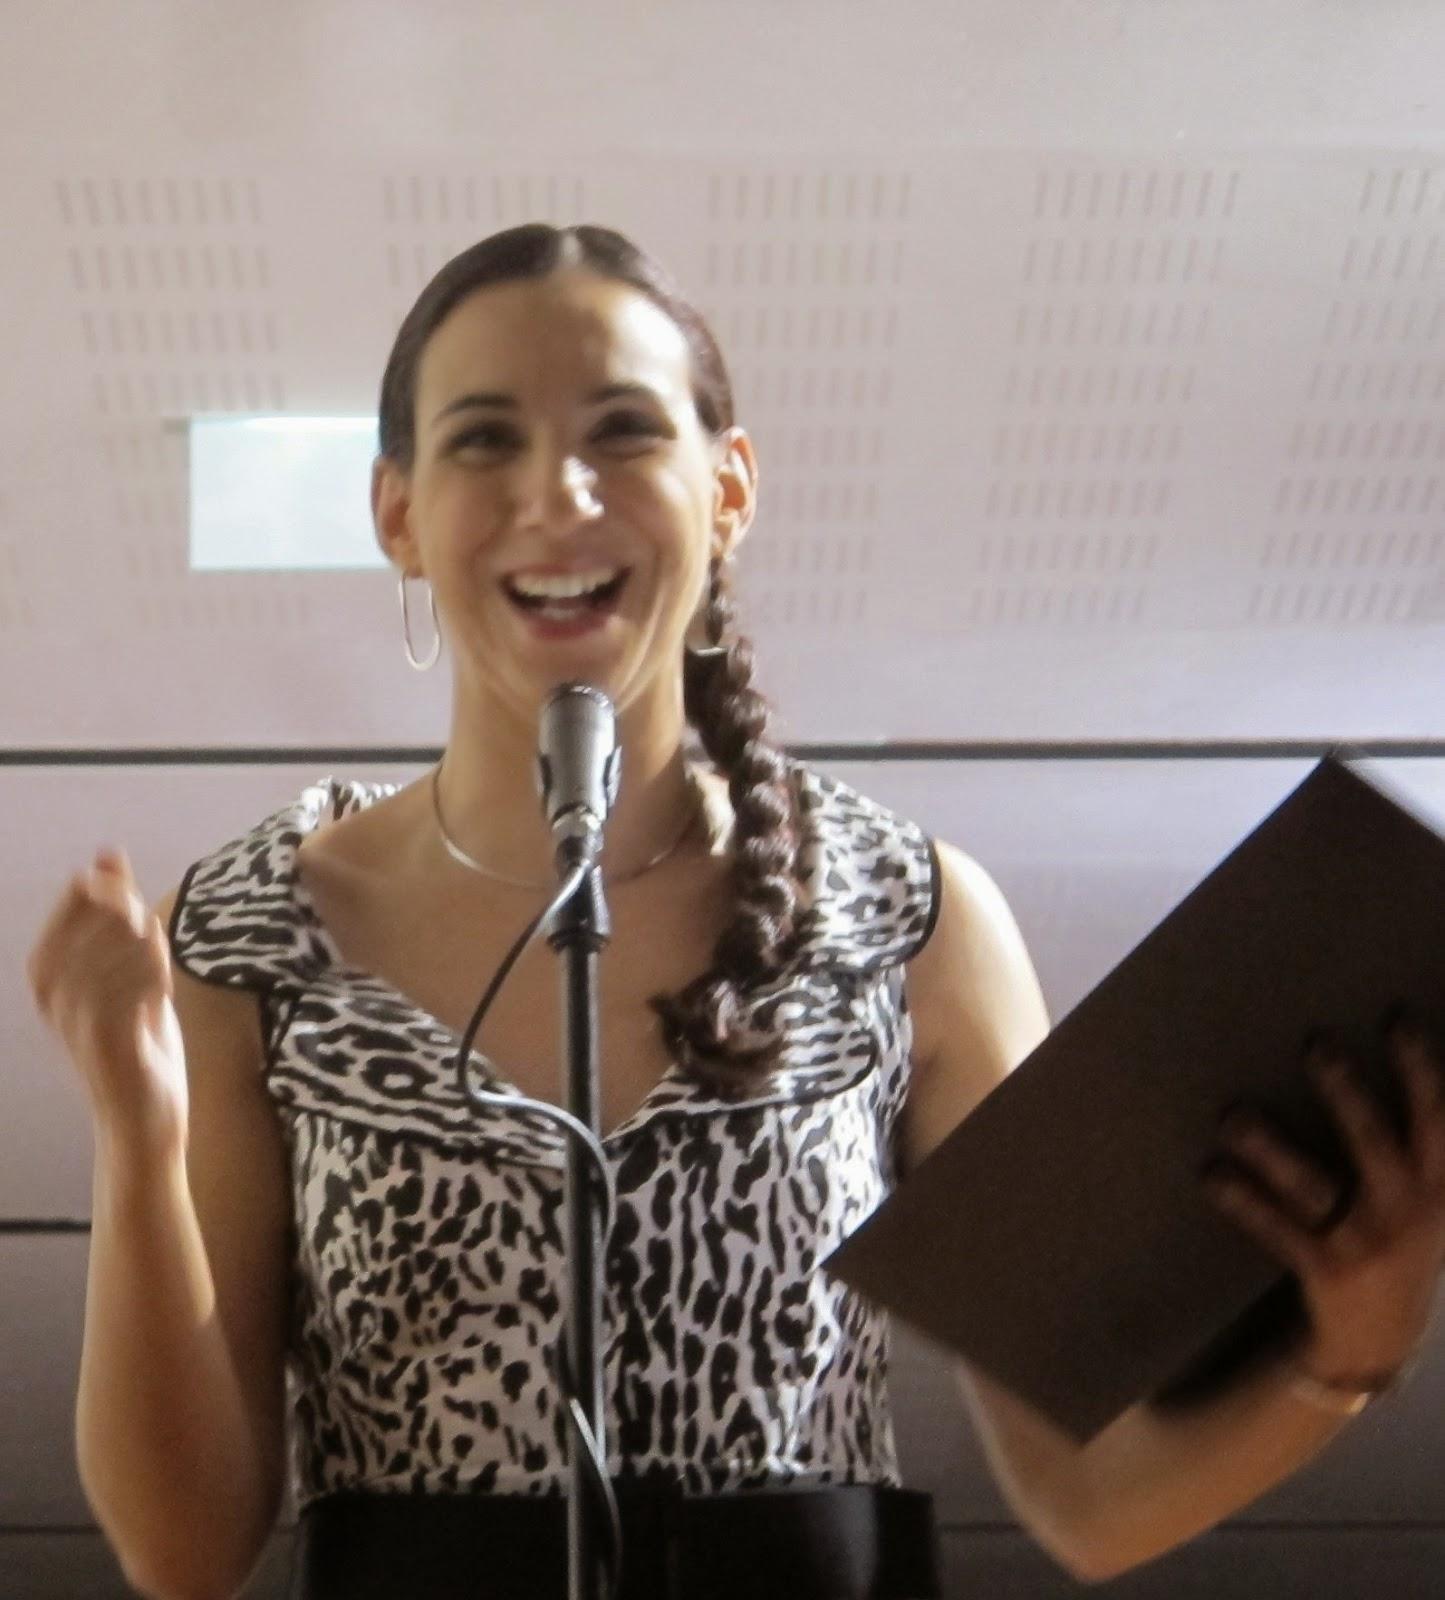 diseur de poesia, cantora, locutora, formadora de canto e técnica vocal